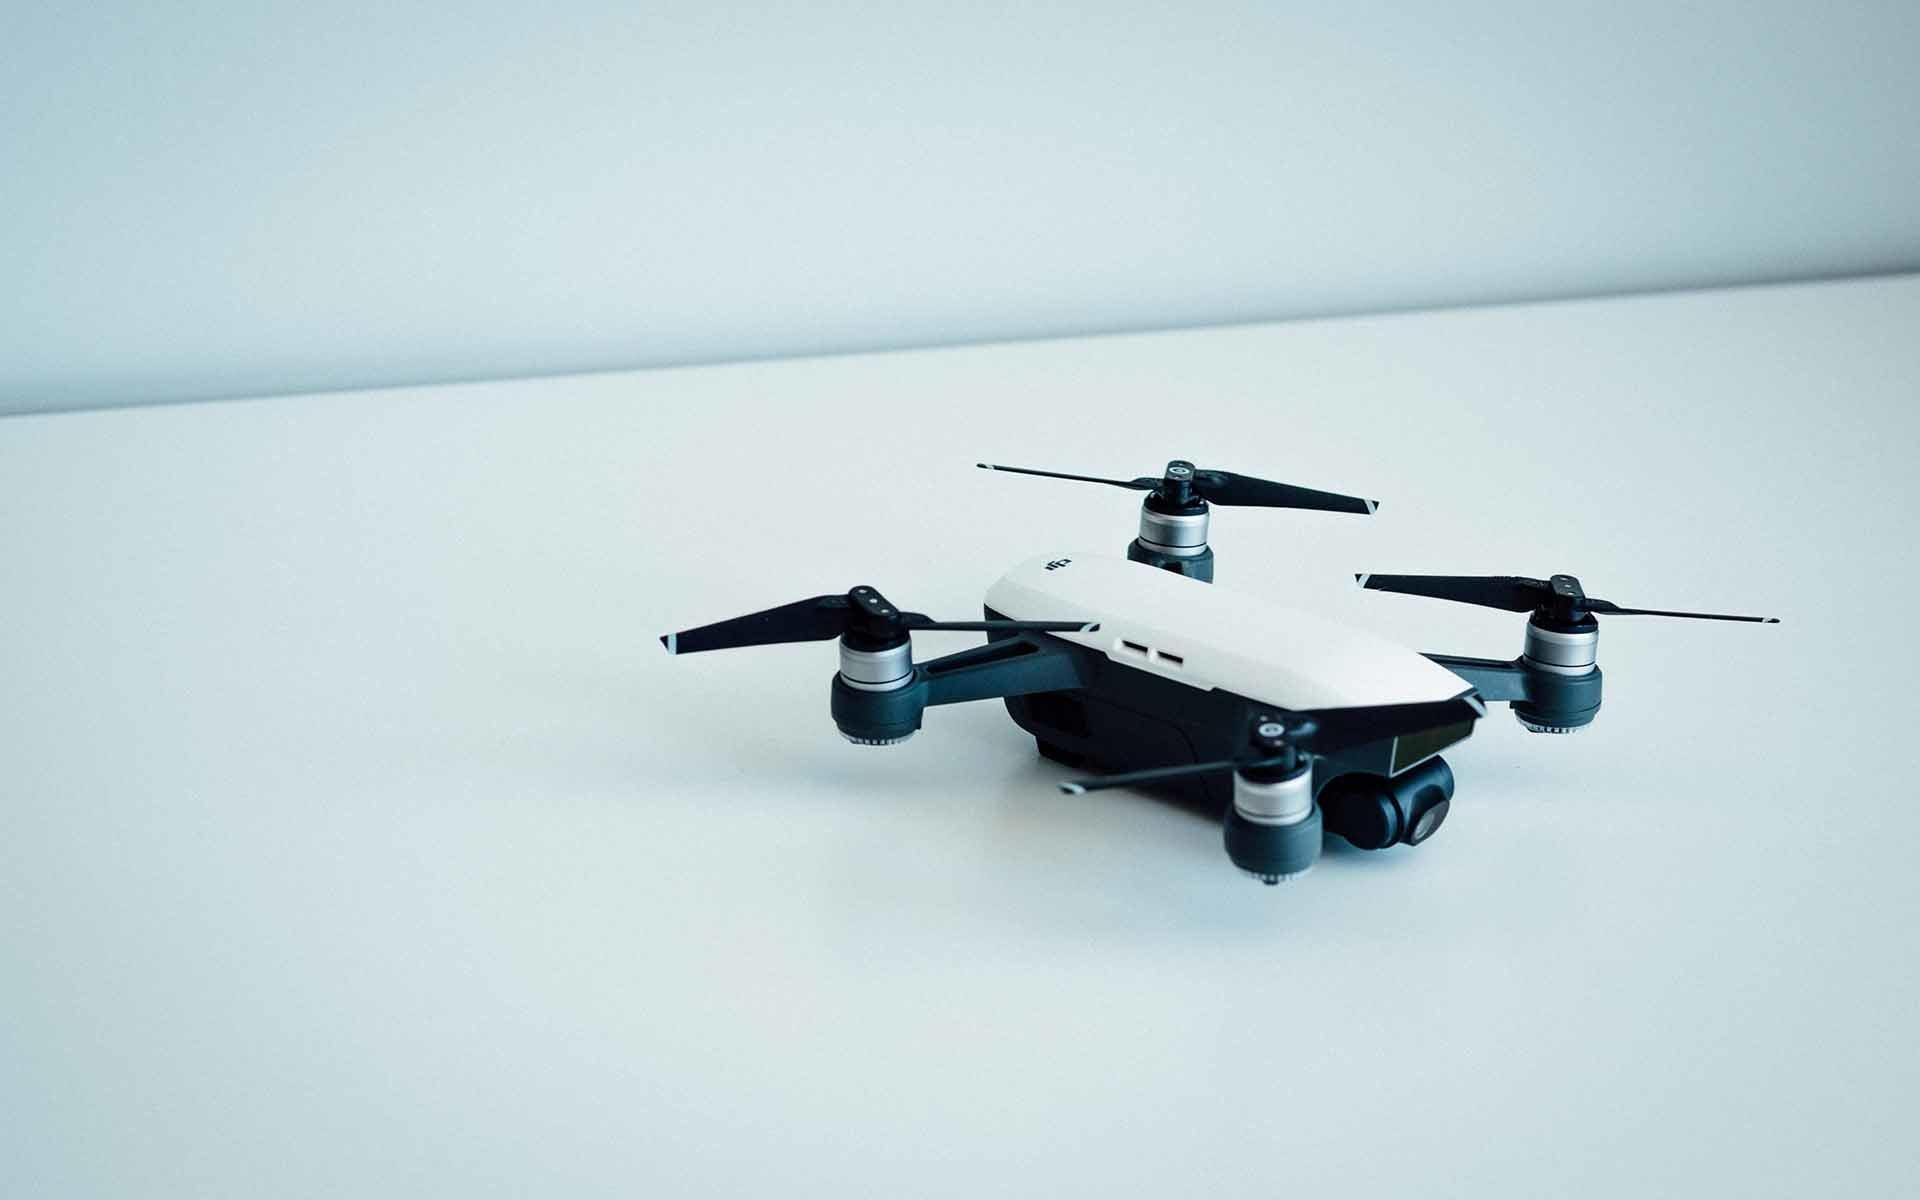 3 hobby drones